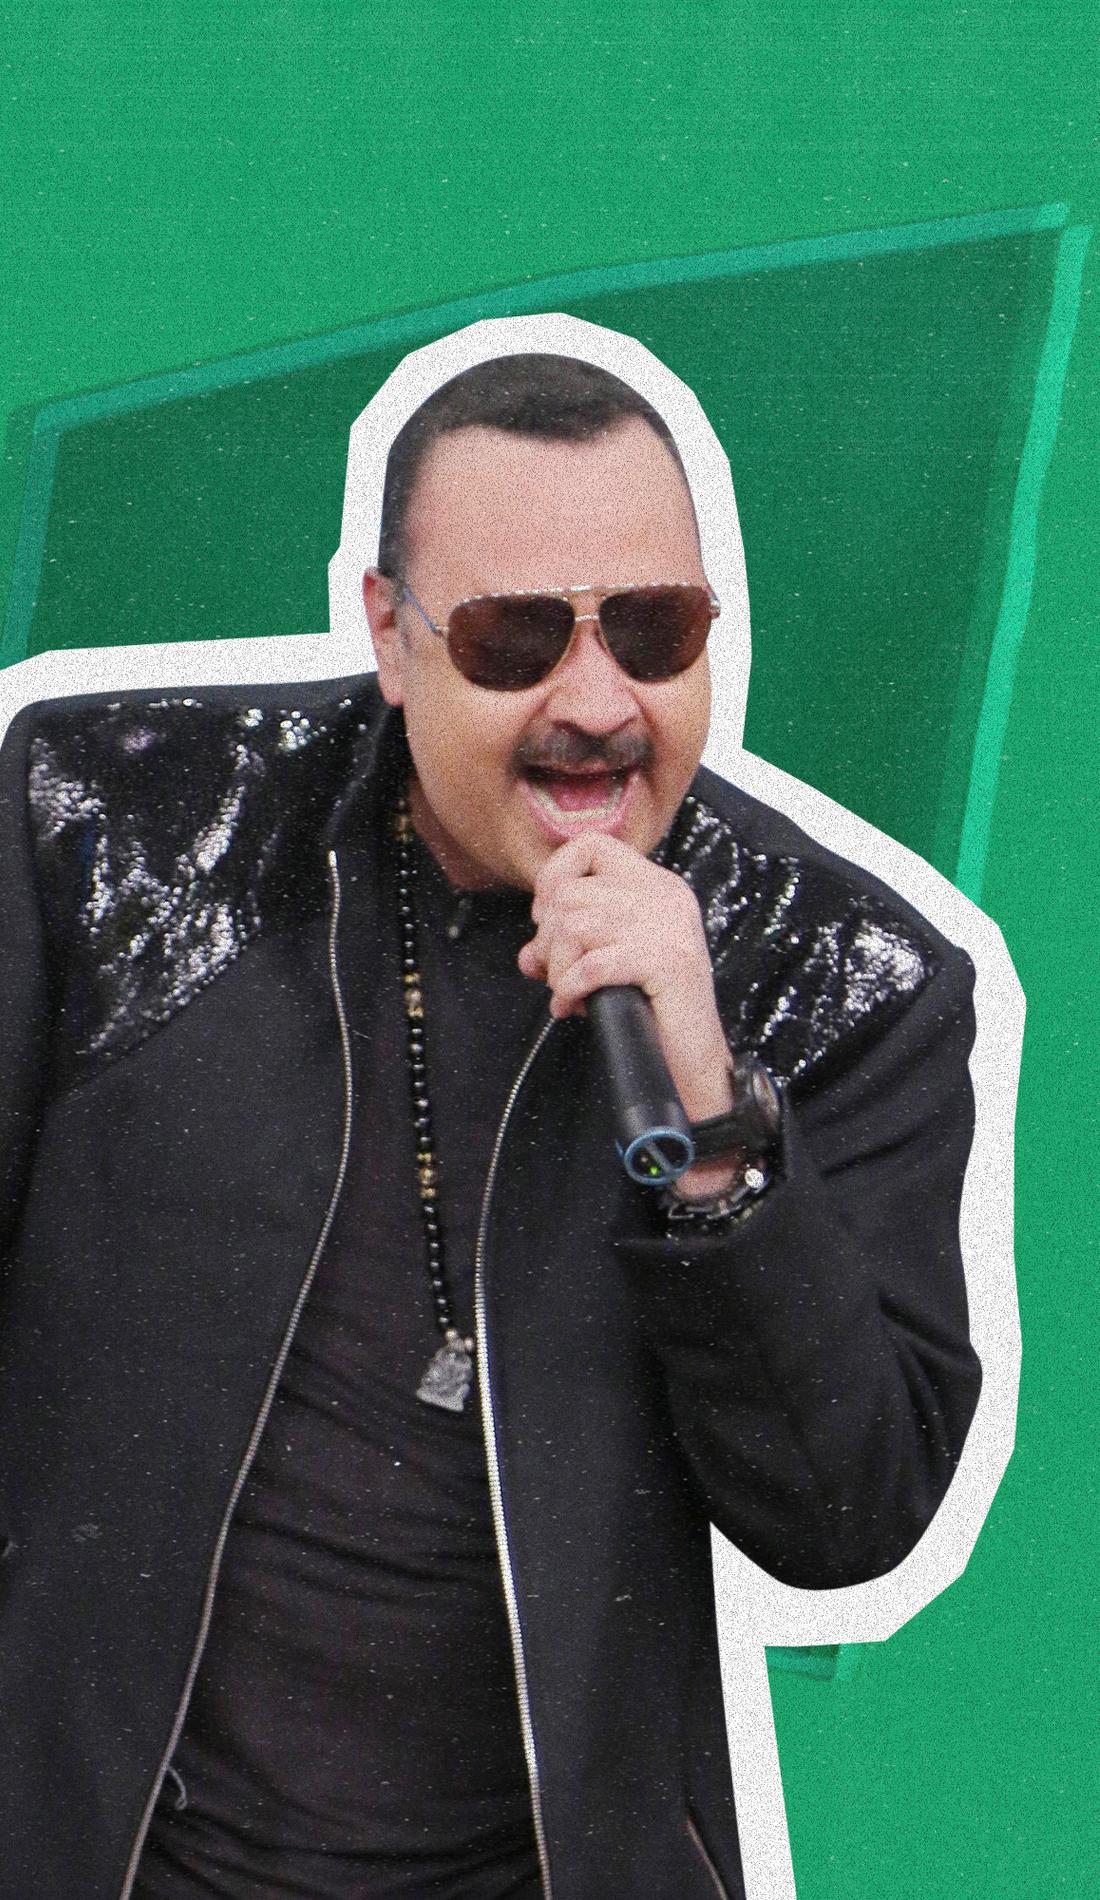 A Pepe Aguilar live event